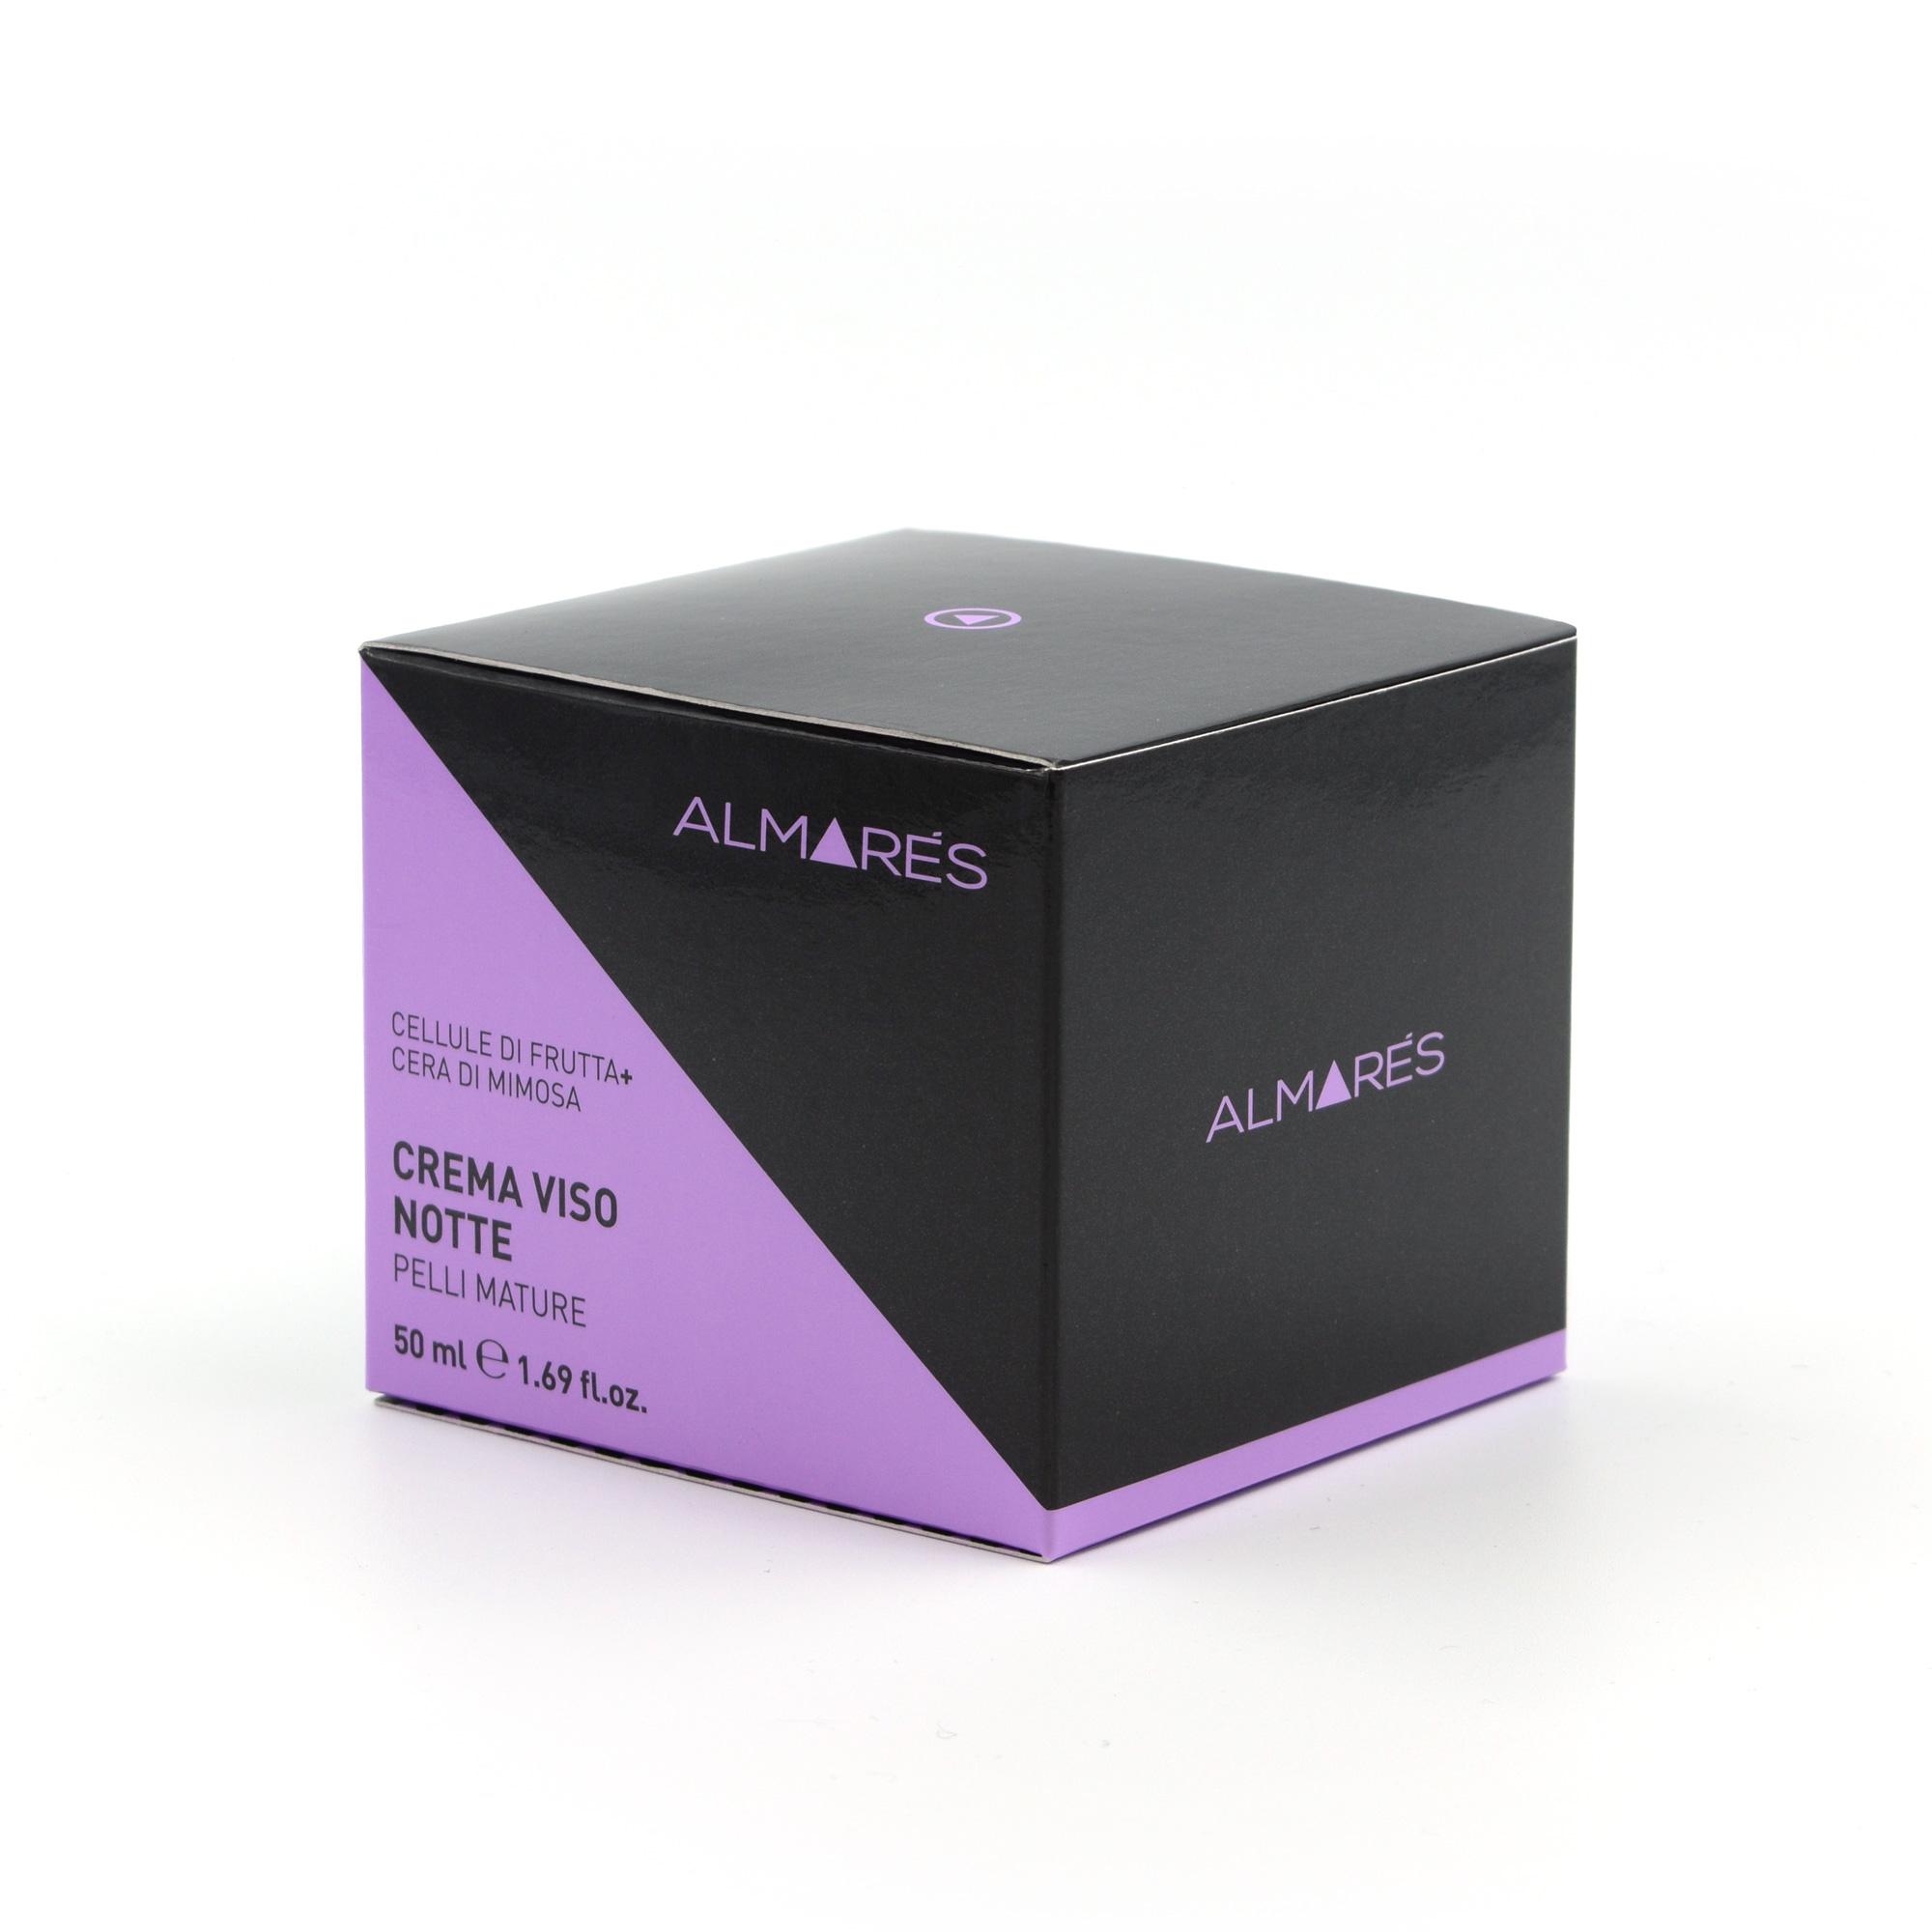 Image of Almarés VITAE crema viso Notte 50ml 8052439842388